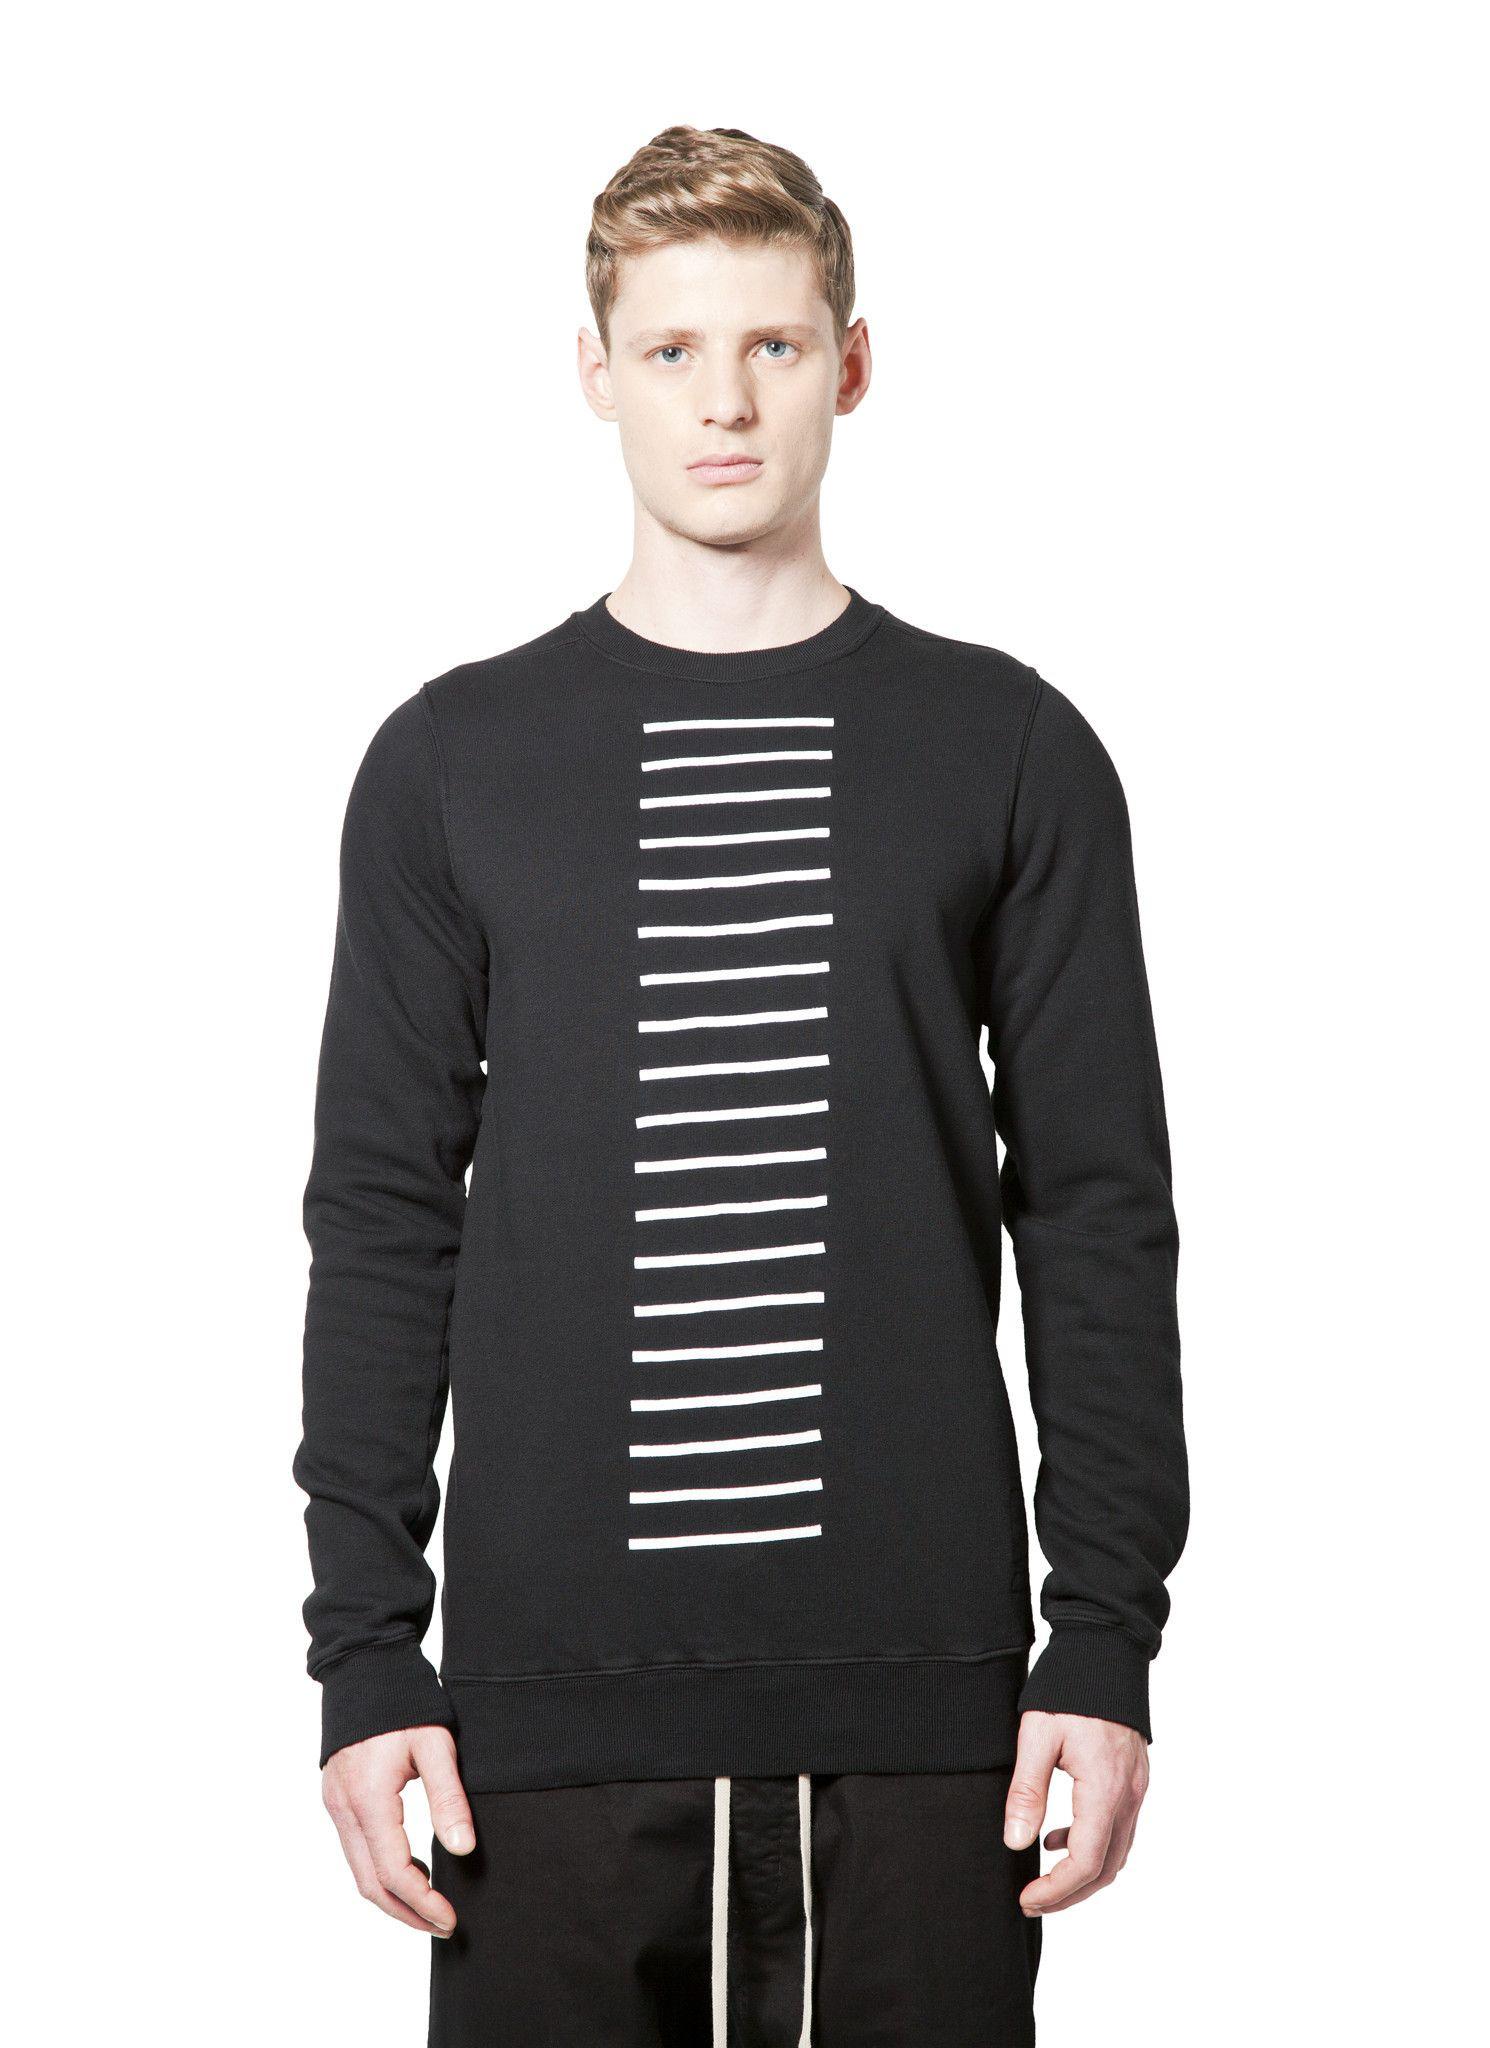 DRKSHDW - Fall Winter 2014 - Menswear // Black Felpa Crewneck Sweater Hum Ribbon